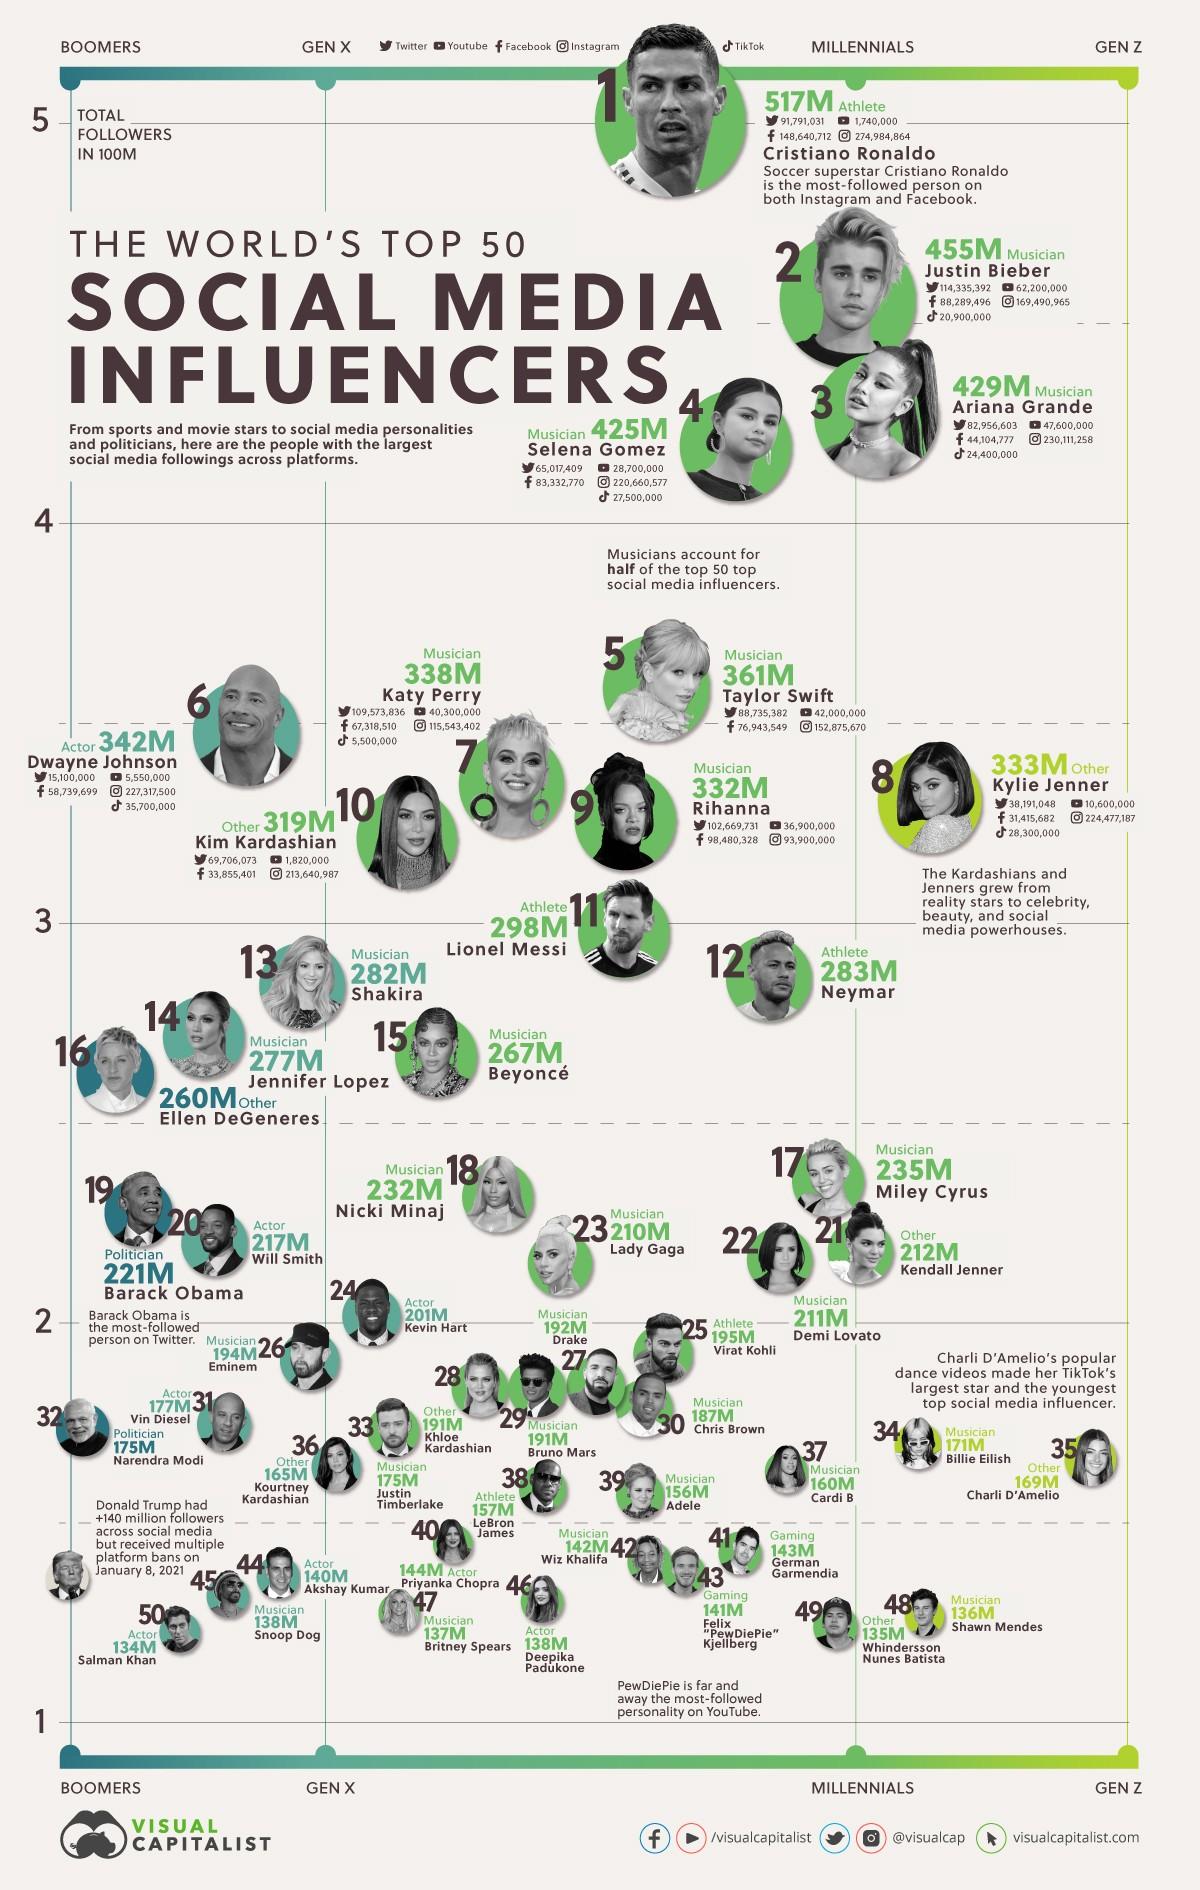 top-50-social-media-influencers-2-1623849415.jpg